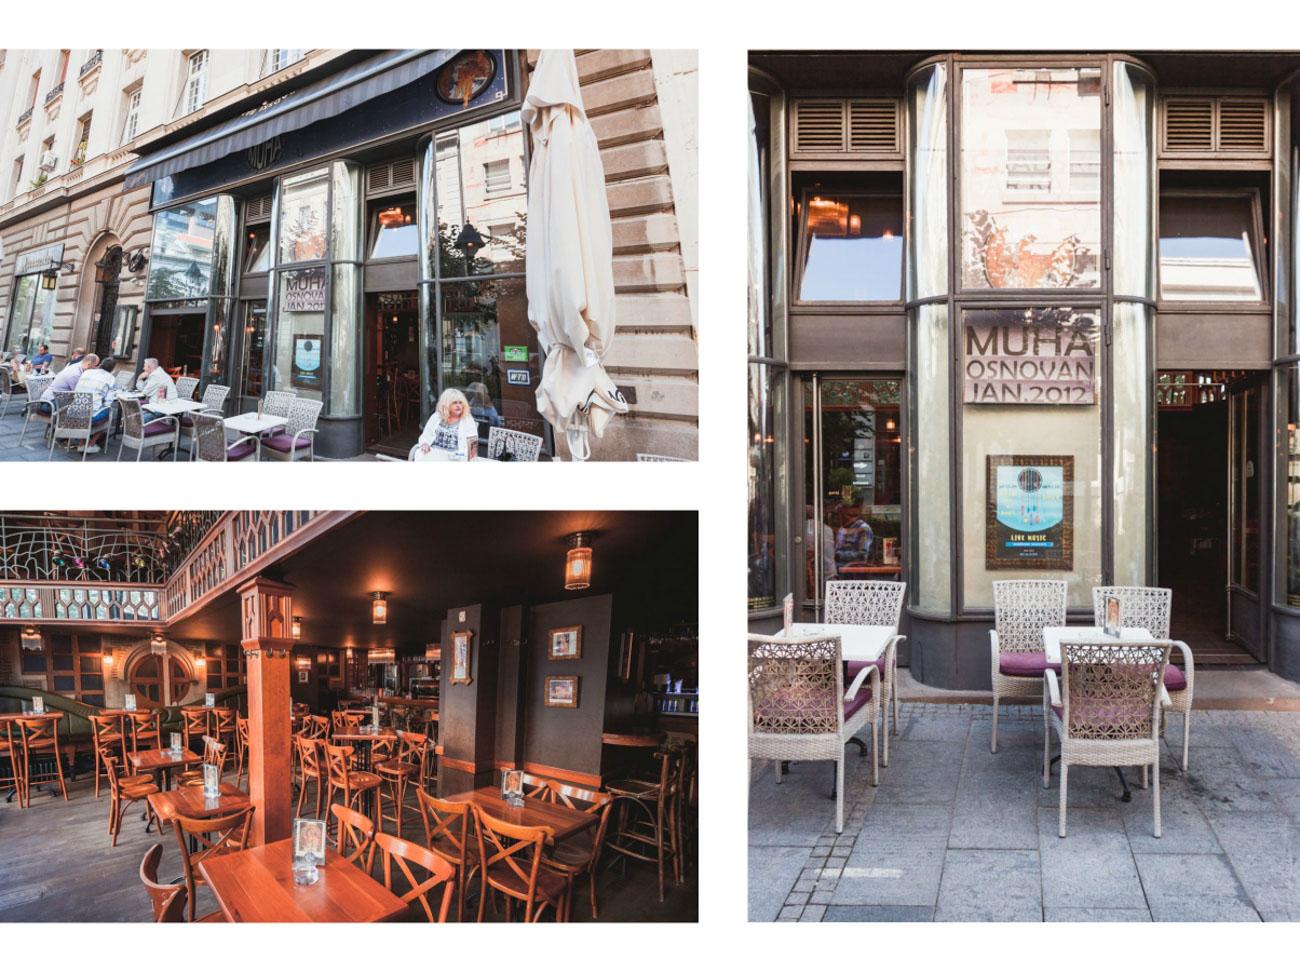 Alfons Mucha restauracja, Belgrad